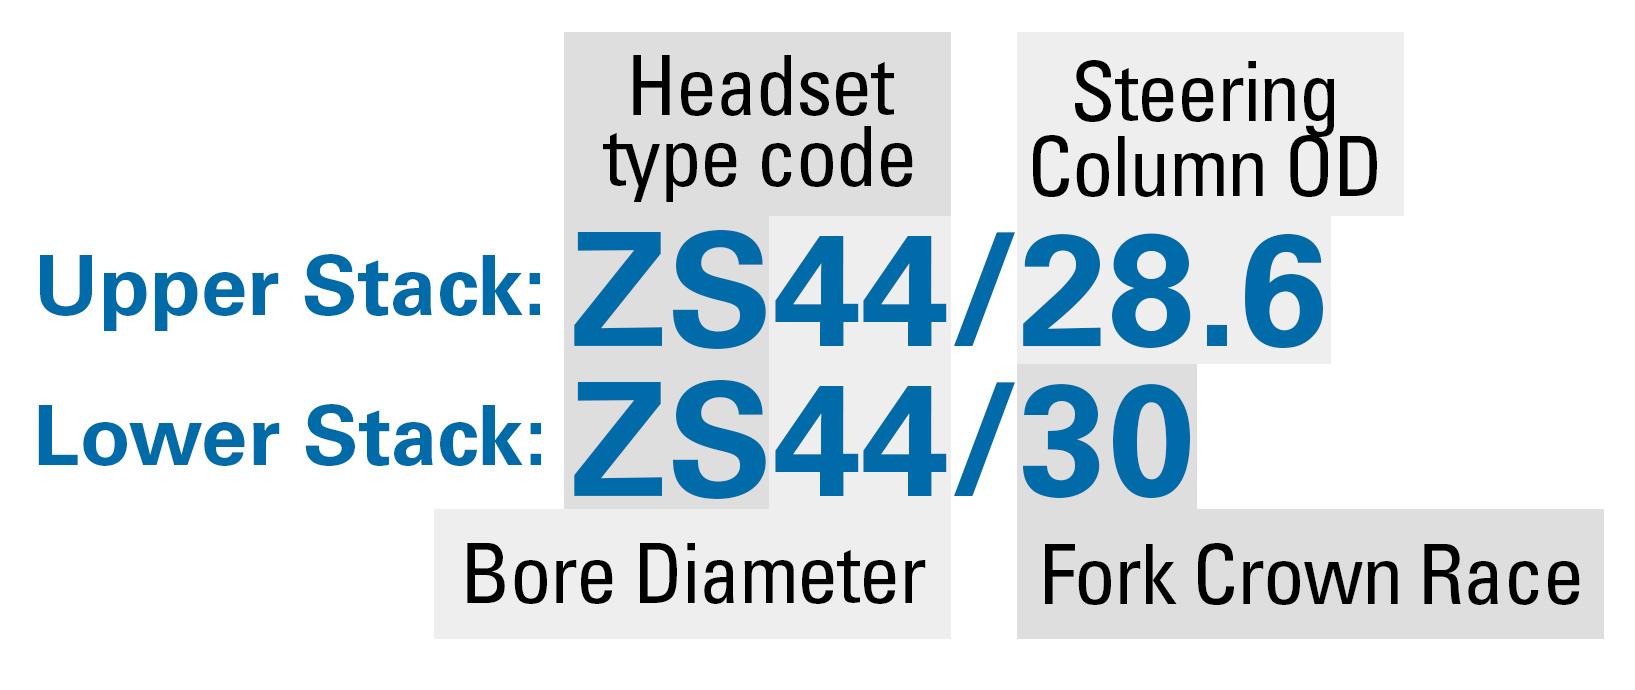 Standardized Headset Identification System | Park Tool